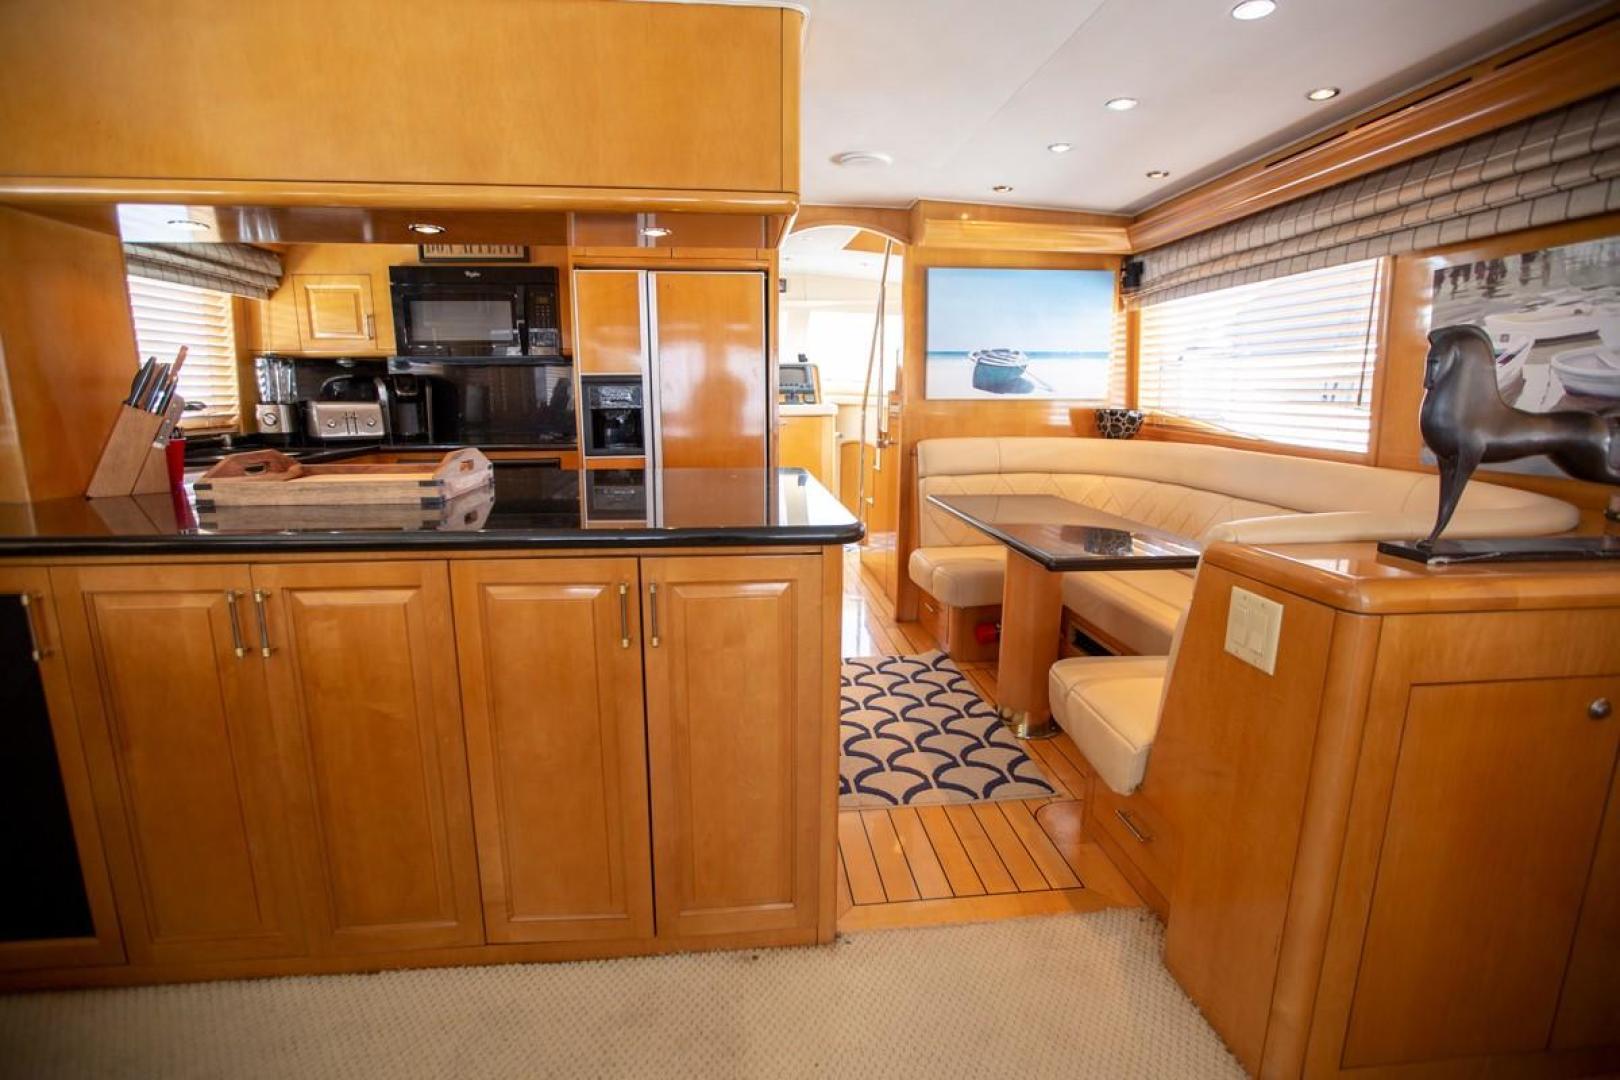 Hatteras-Cockpit Motor Yacht 2000-Getaway Ft. Lauderdale-Florida-United States-977367 | Thumbnail